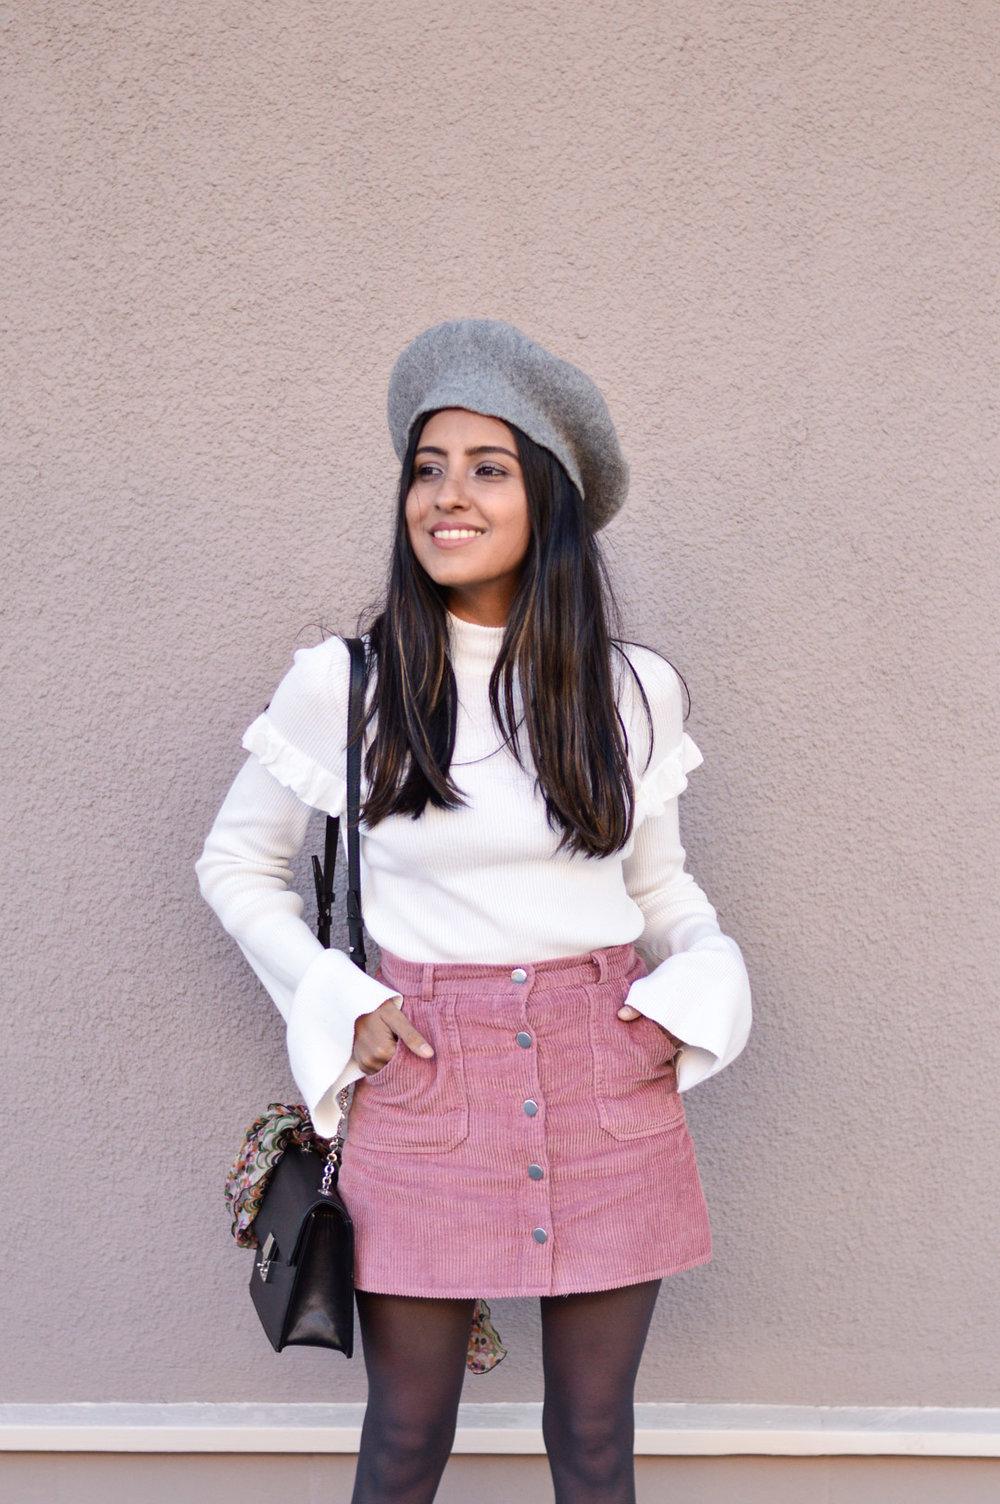 corduroy-skirt-pink-beret-fall-fashion-blogger 6